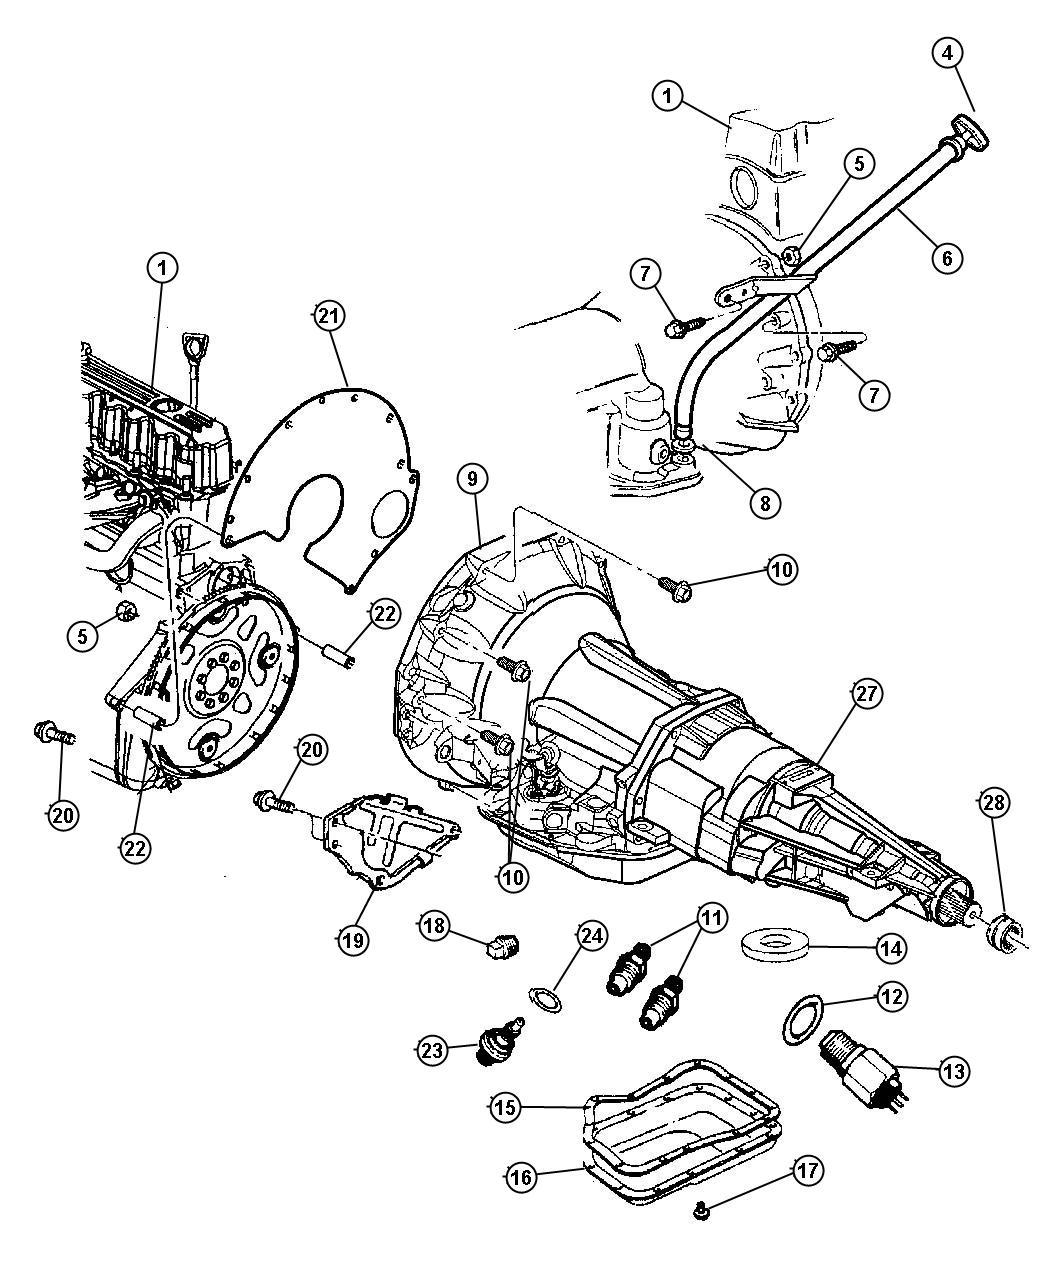 Jeep Indicator Transmission Fluid Level